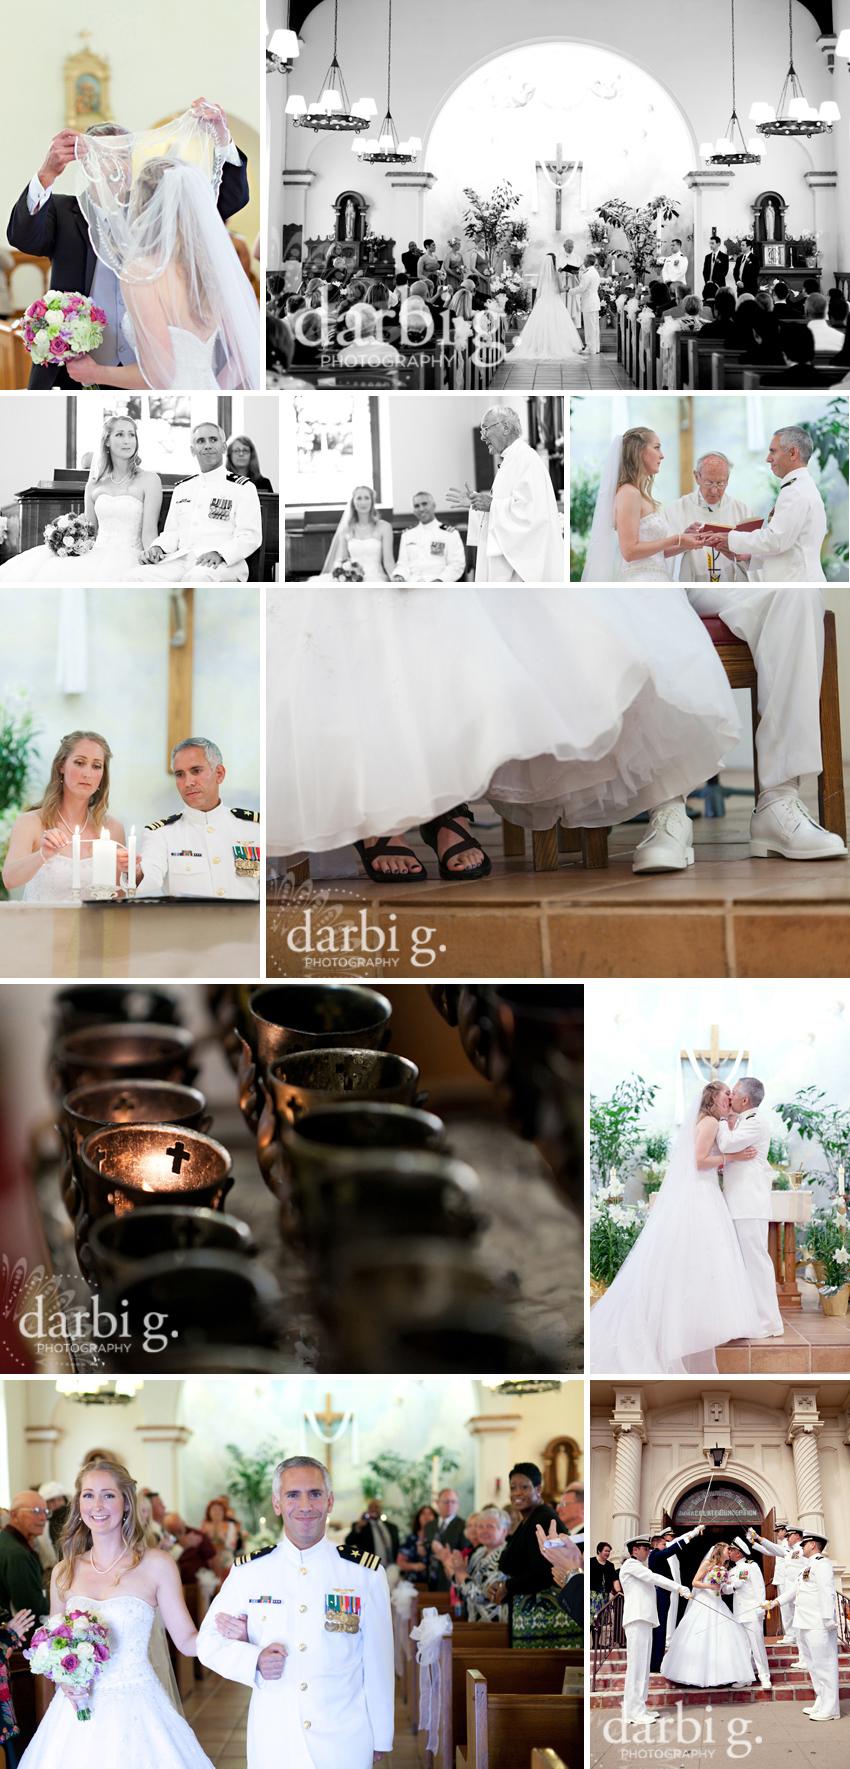 San Diego wedding photography by Kansas city wedding photographer Darbi G.